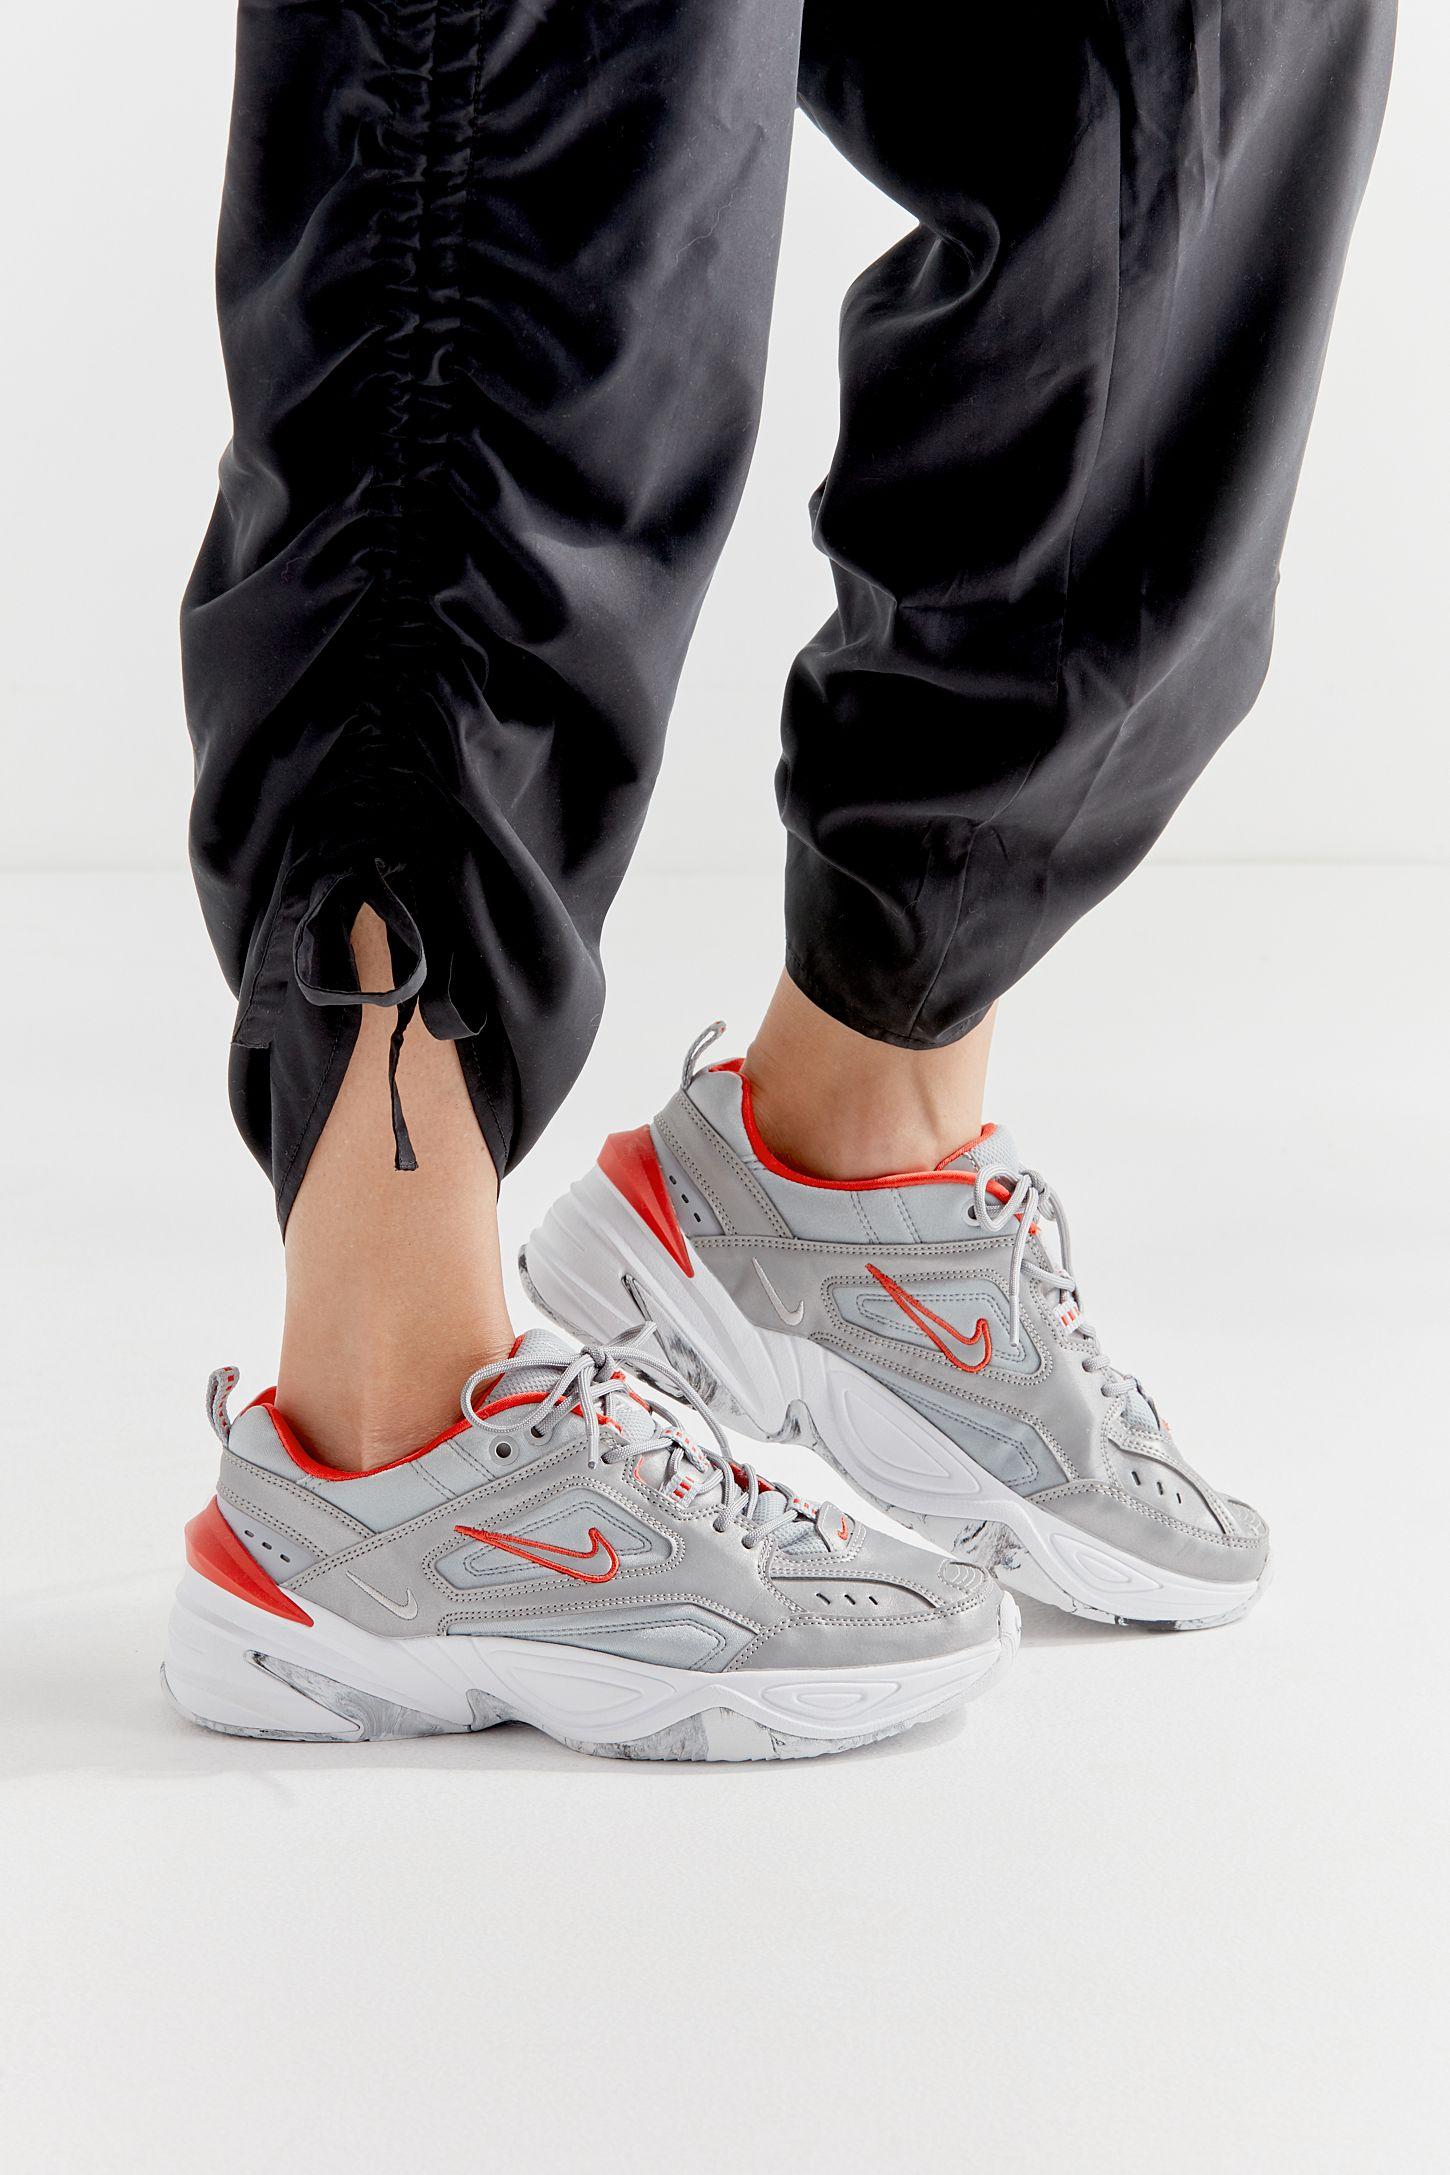 official photos 8103c a1627 Slide View  6  Nike M2K Tekno Metallic Sneaker